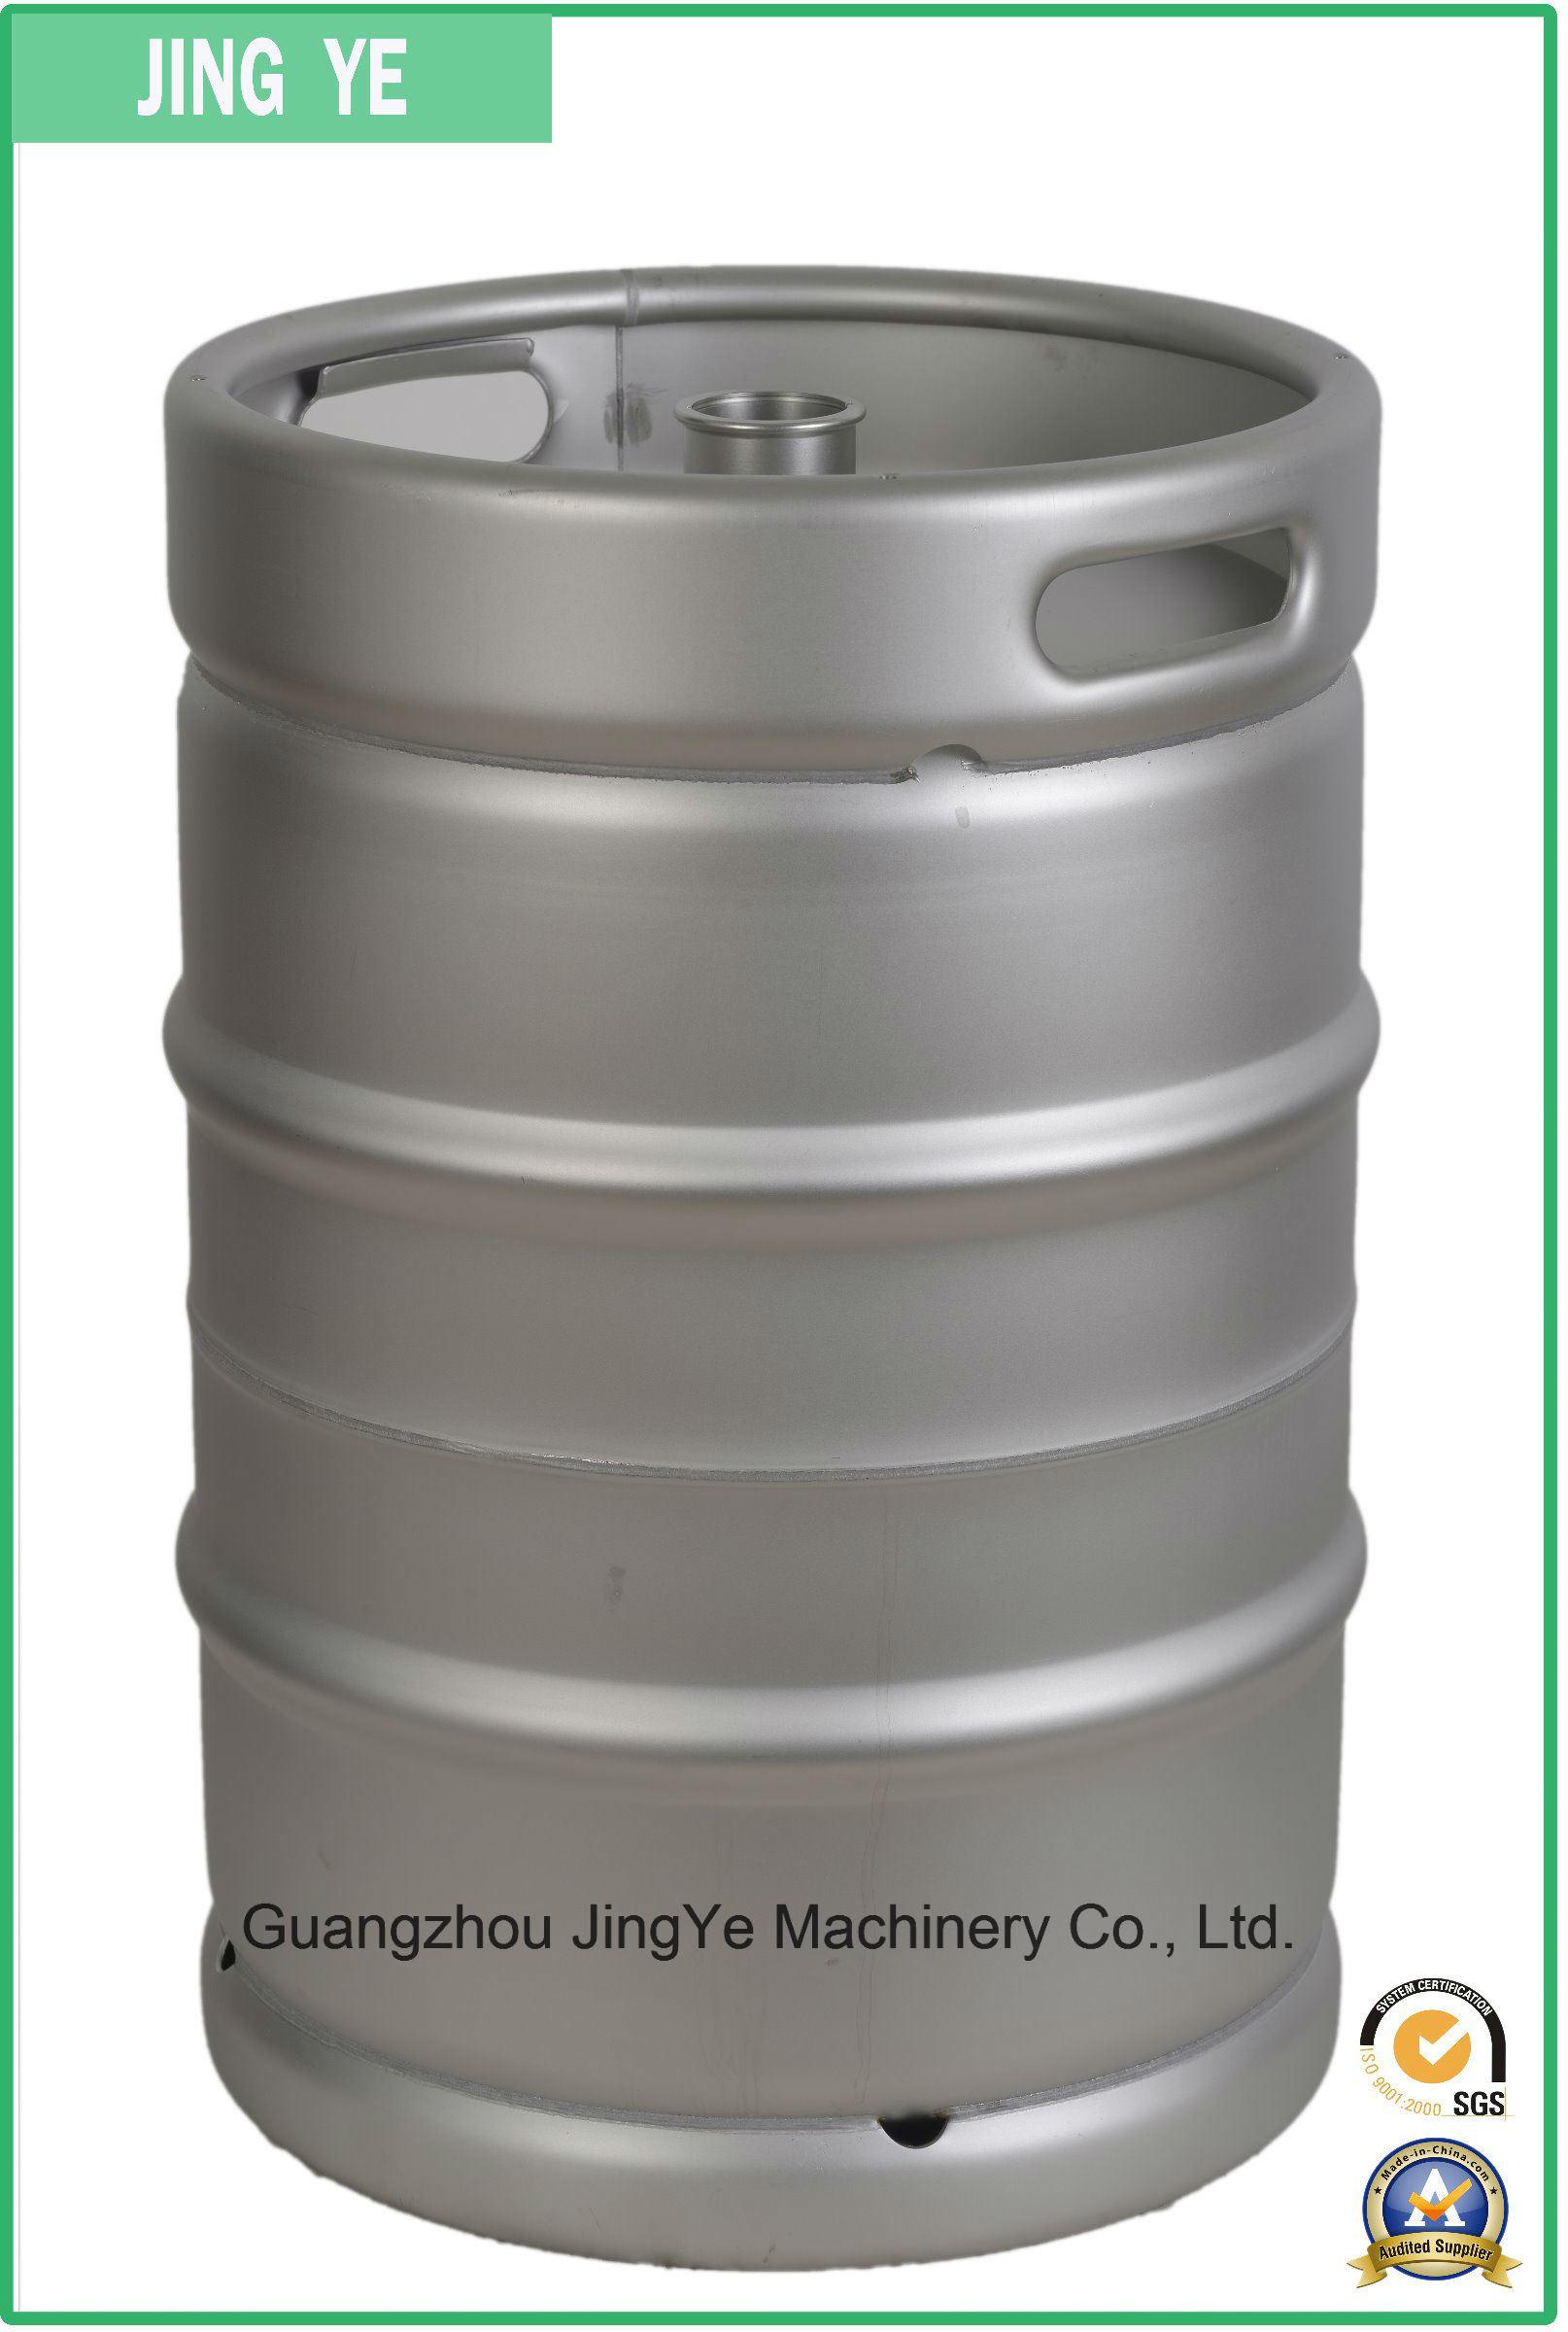 15.5 Gallon Us Barrel, Beer Keg